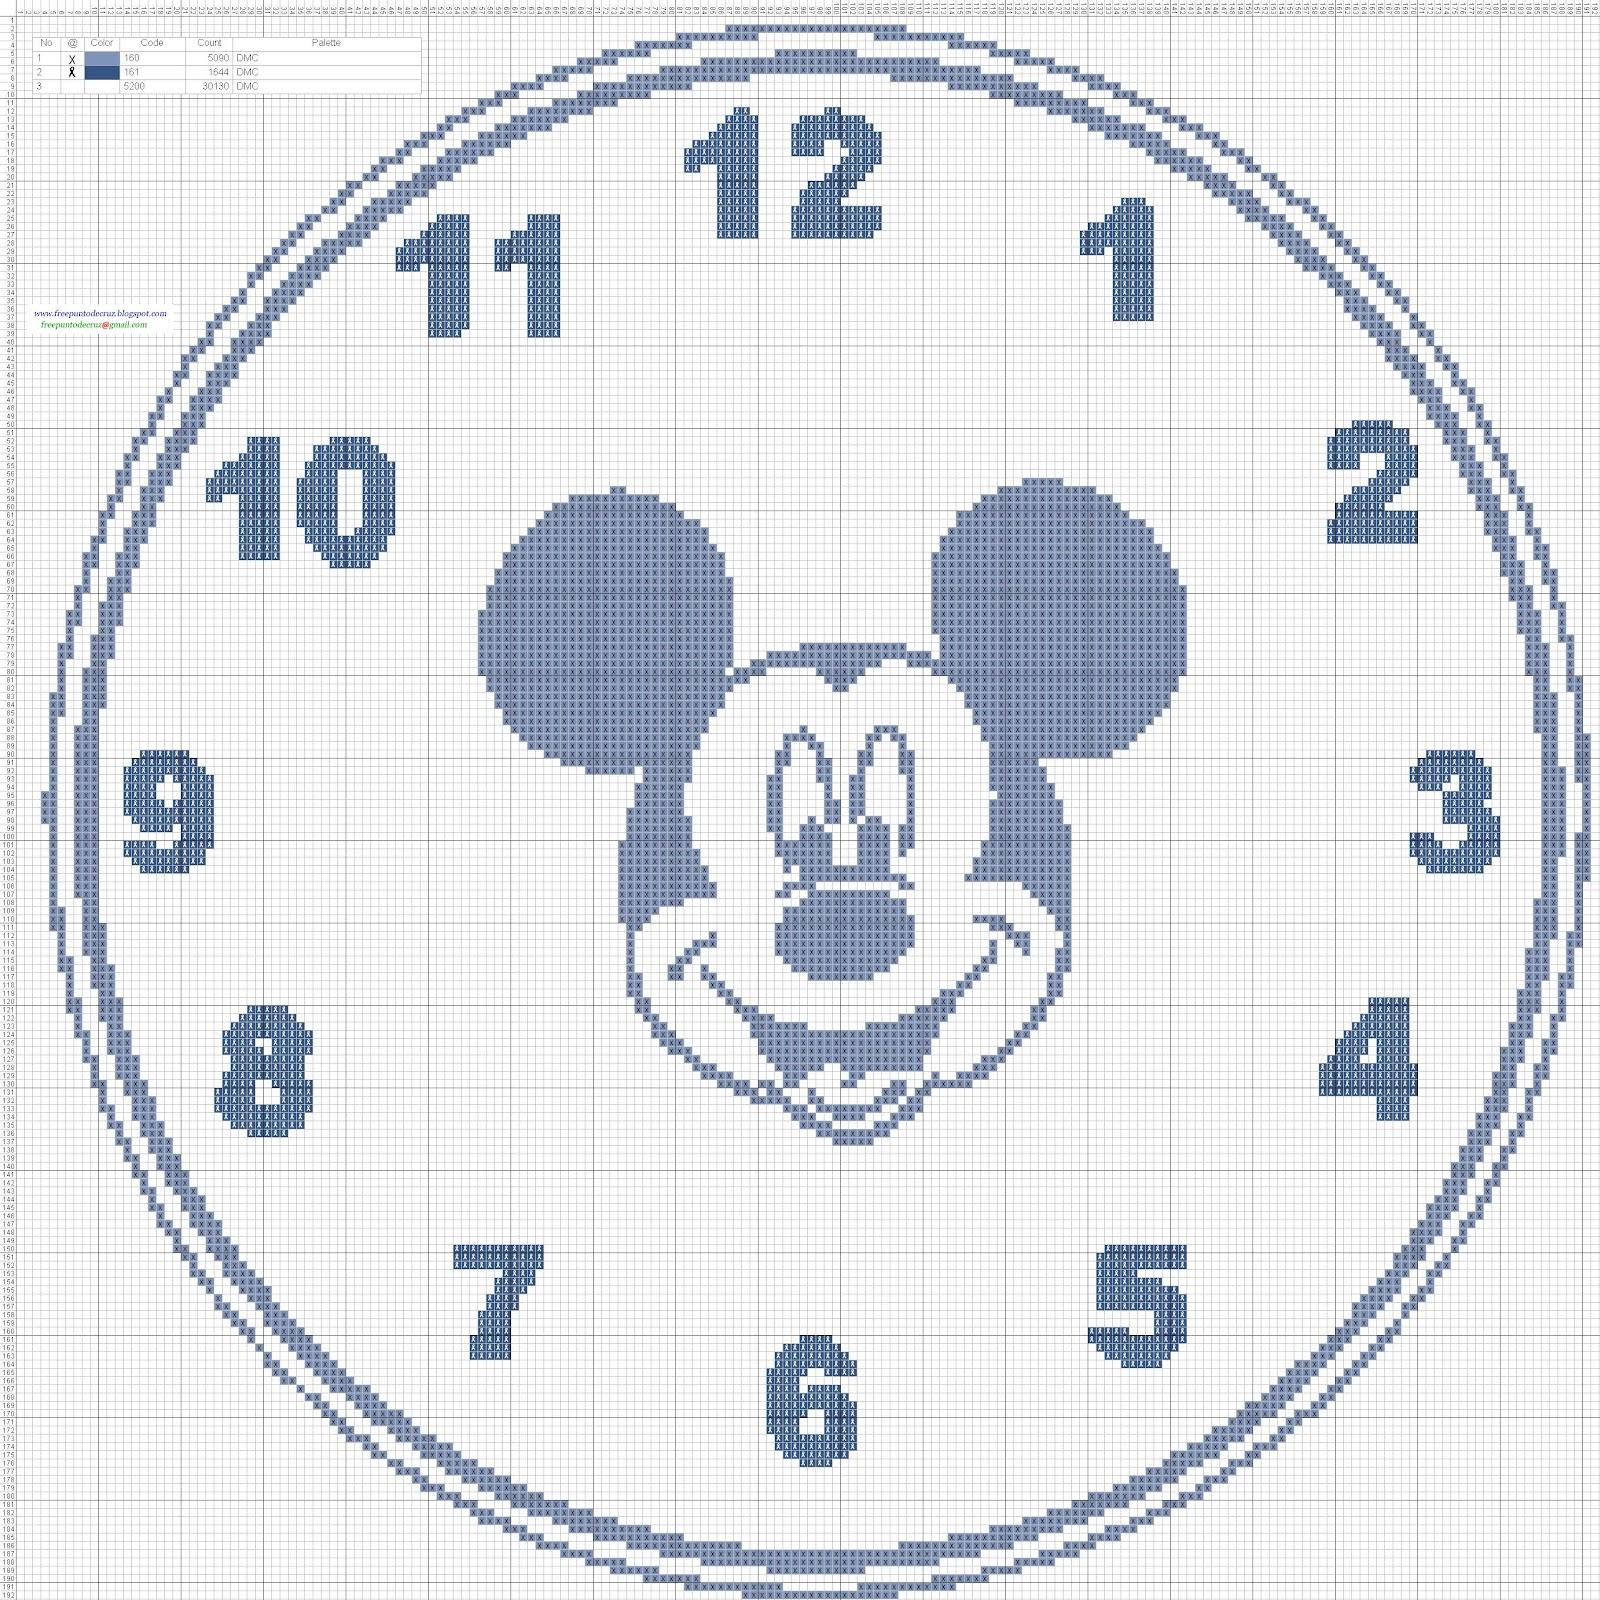 http://2.bp.blogspot.com/-TDiZHfvohHI/T4yJnV40GMI/AAAAAAAABFQ/1Wm2AXOapJY/s1600/Reloj+cara+Mickey+Mouse+Punto+de+cruz.jpg